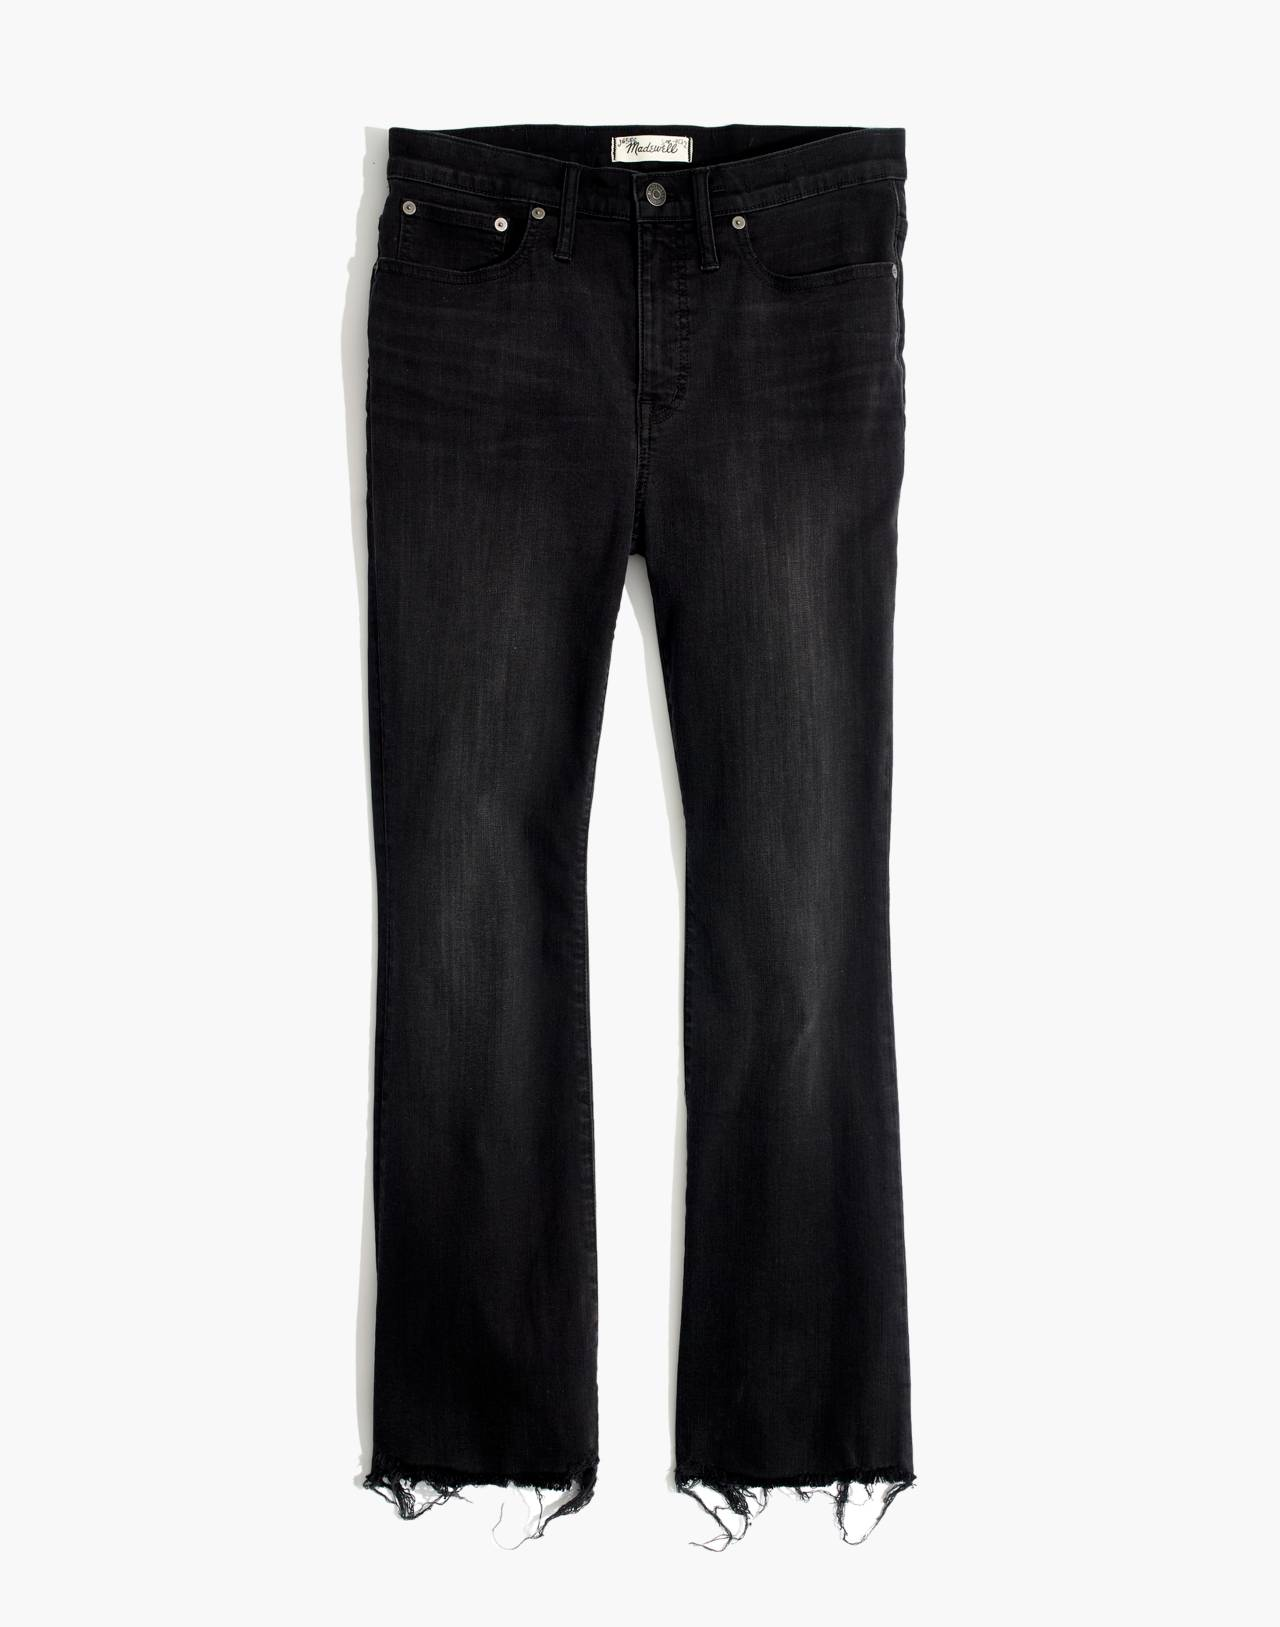 Petite Cali Demi-Boot Jeans in Berkeley Black: Chewed-Hem Edition in berkeley wash image 4